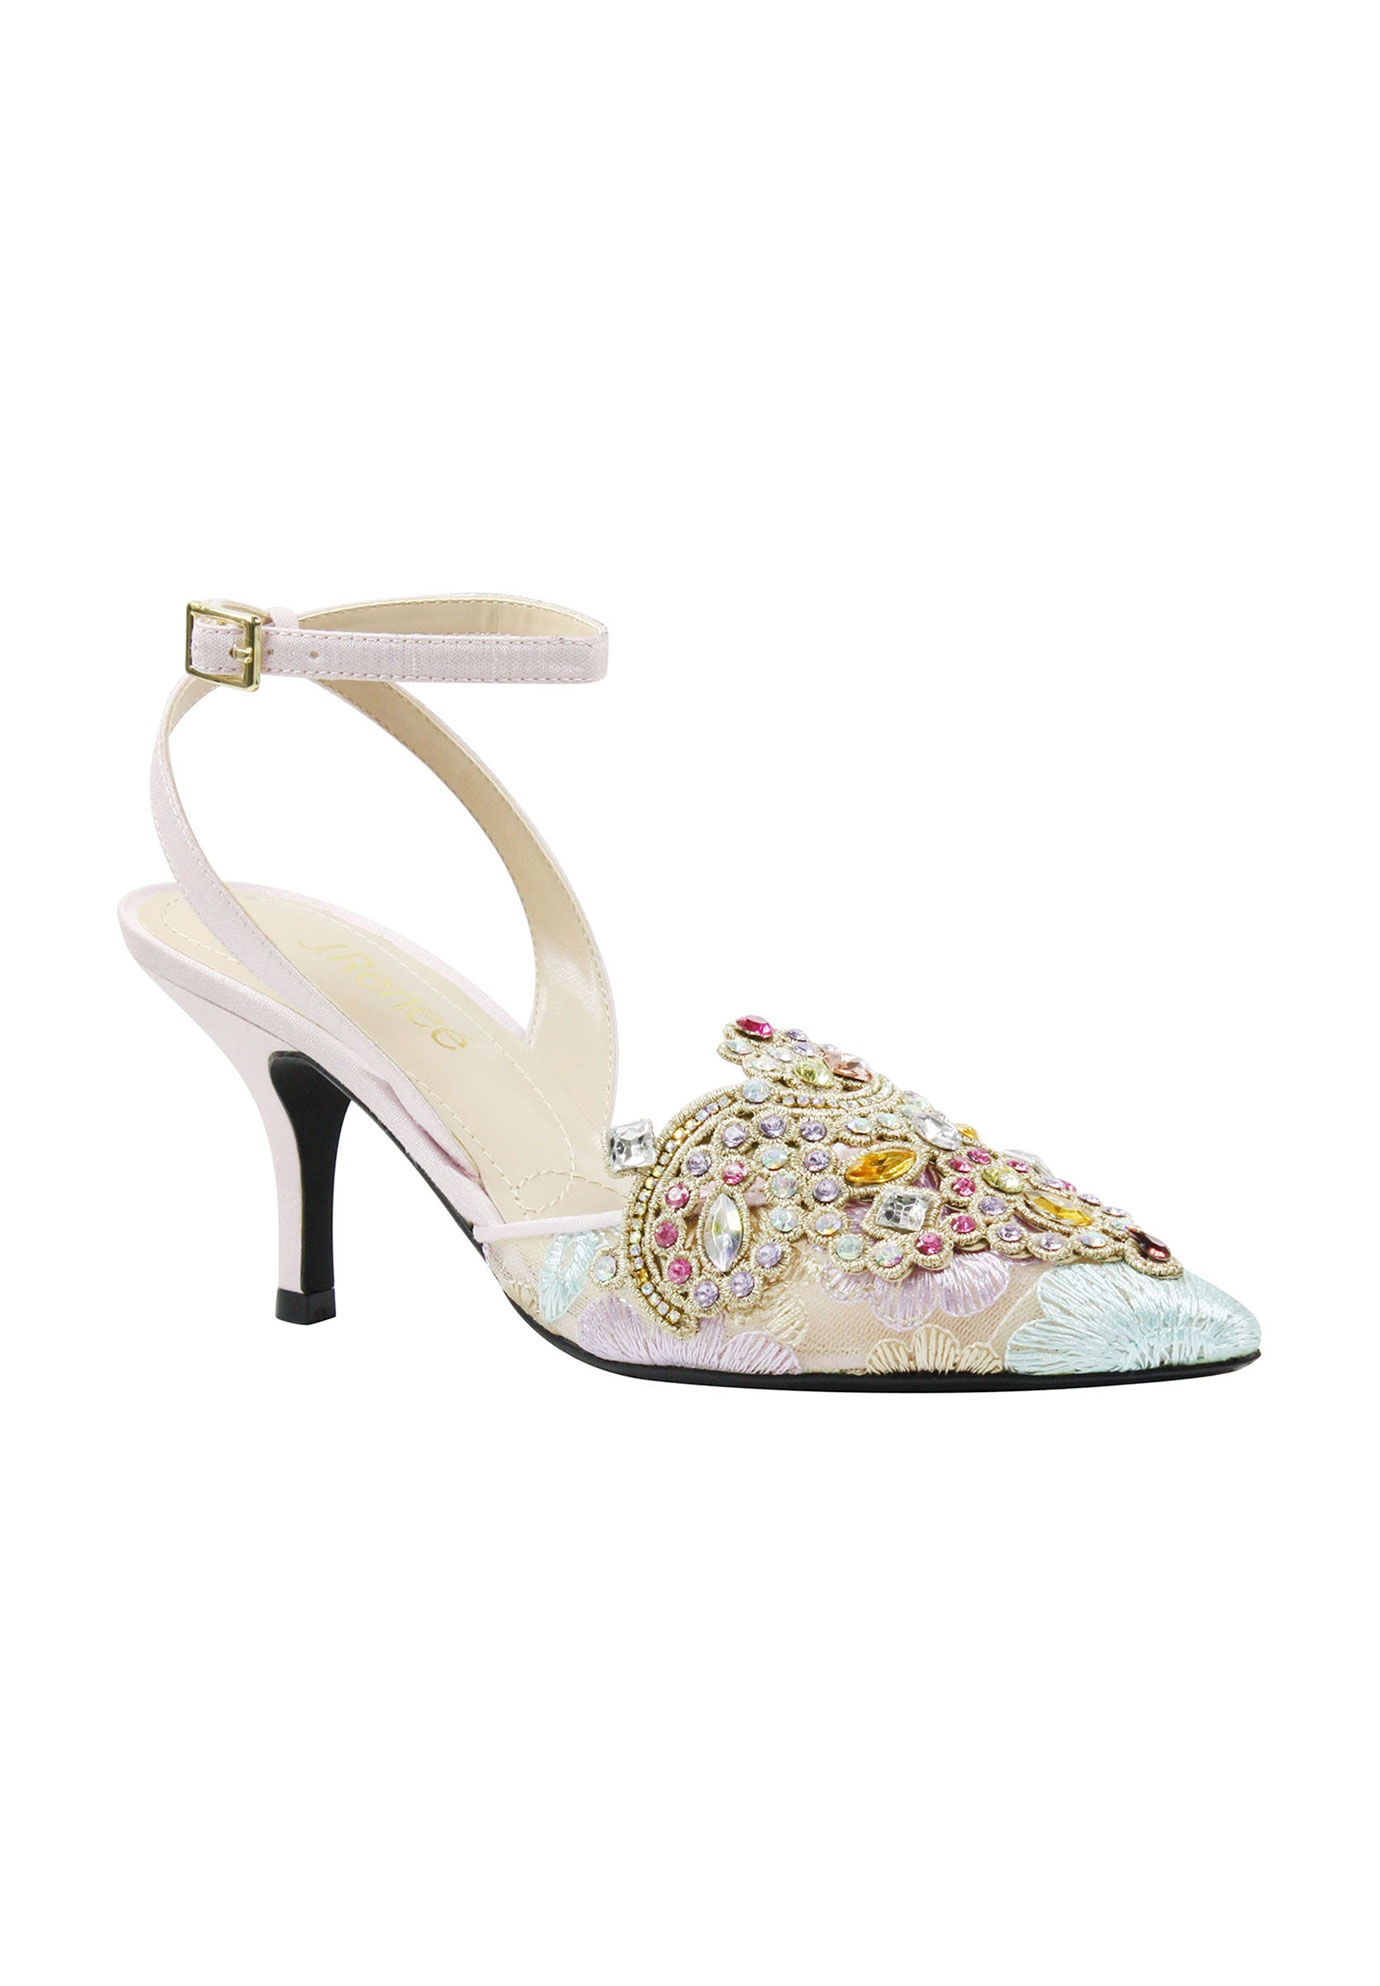 2433e6270f8e Desdemona Pumps by J. Renee - Women s Plus Size Clothing